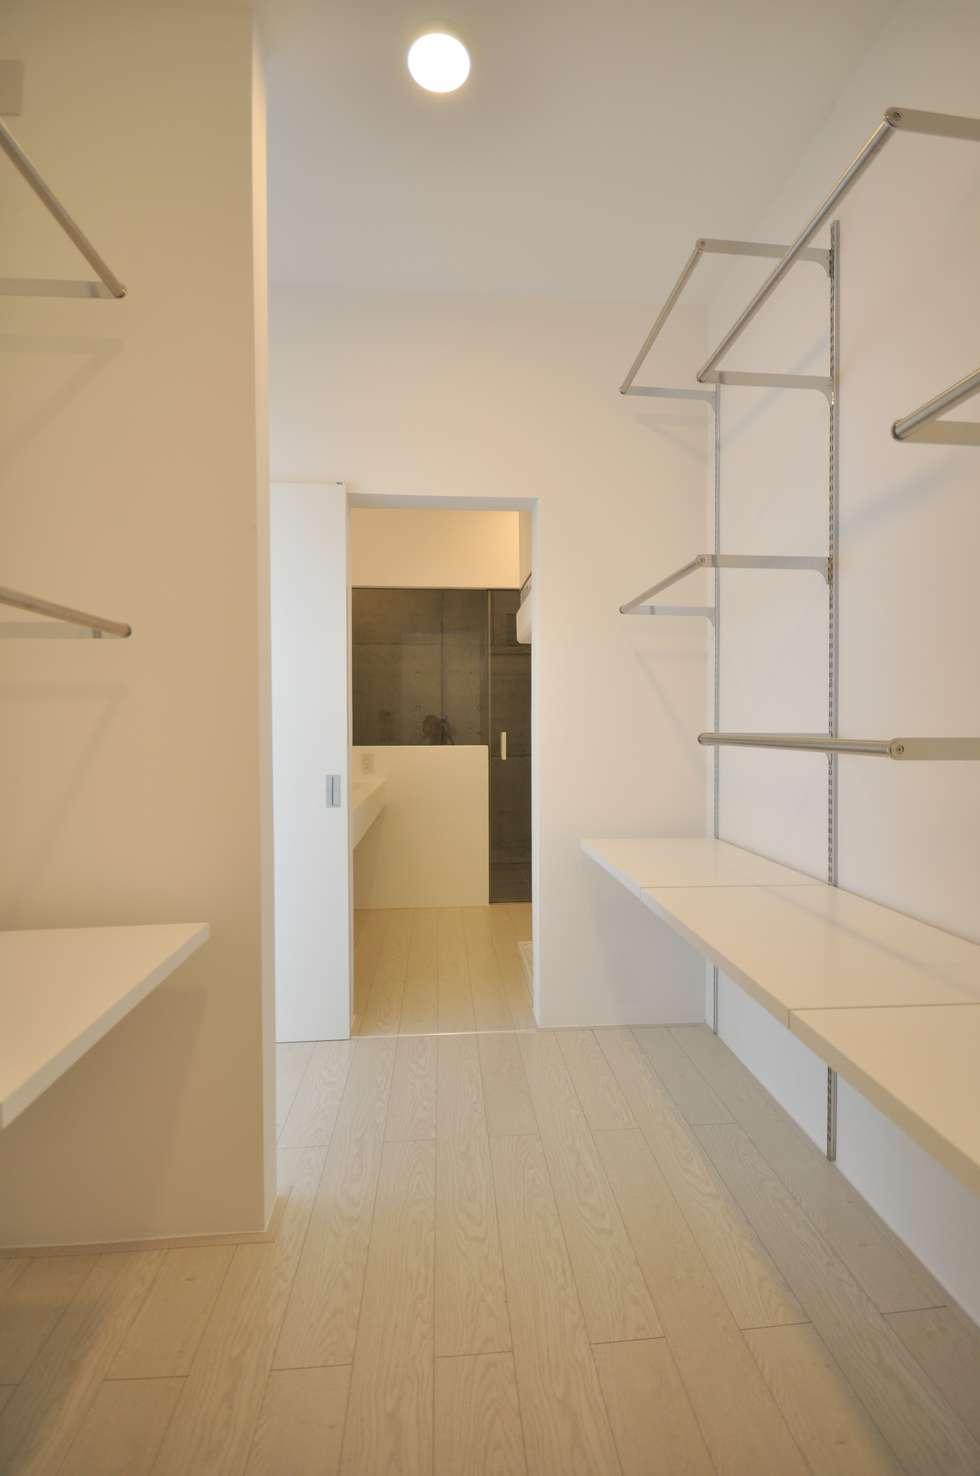 Beautiful Beistelltisch Design Kreten Innen Ausenraume Gallery ...